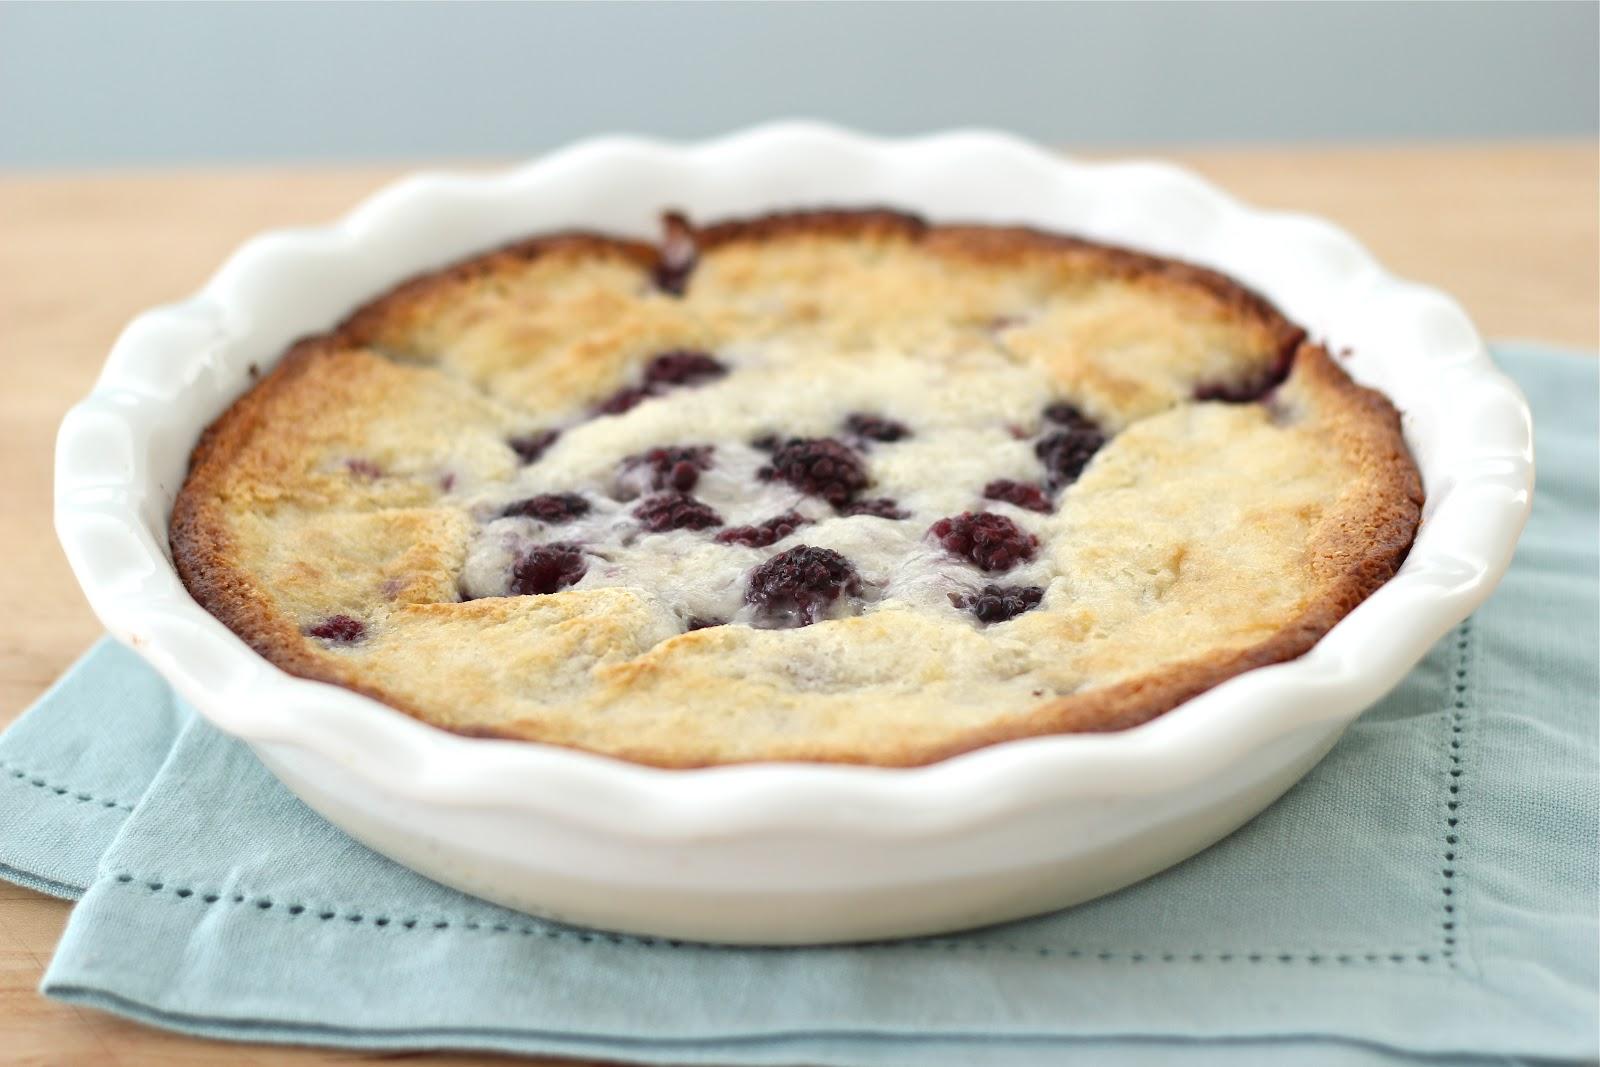 ... Steffens Hobick: Mrs. Ross's Blackberry Cobbler | Baking with Emma